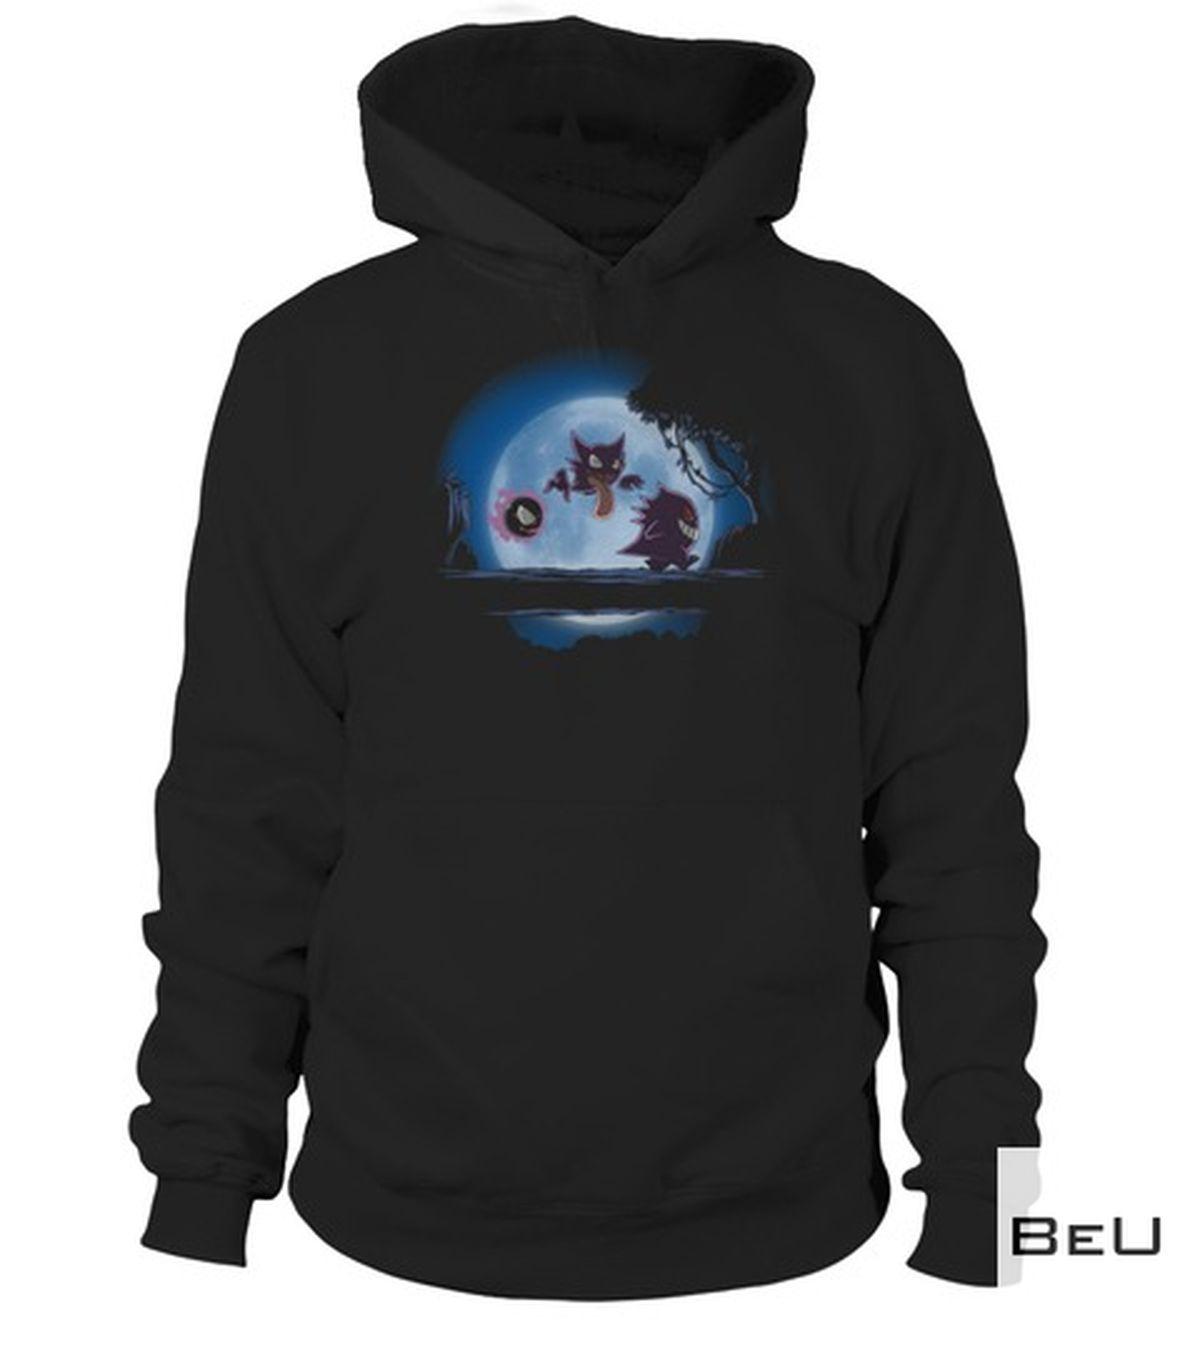 Amazon Pokemon Gengar Walking And The Moon Shirt, hoodie, tank top